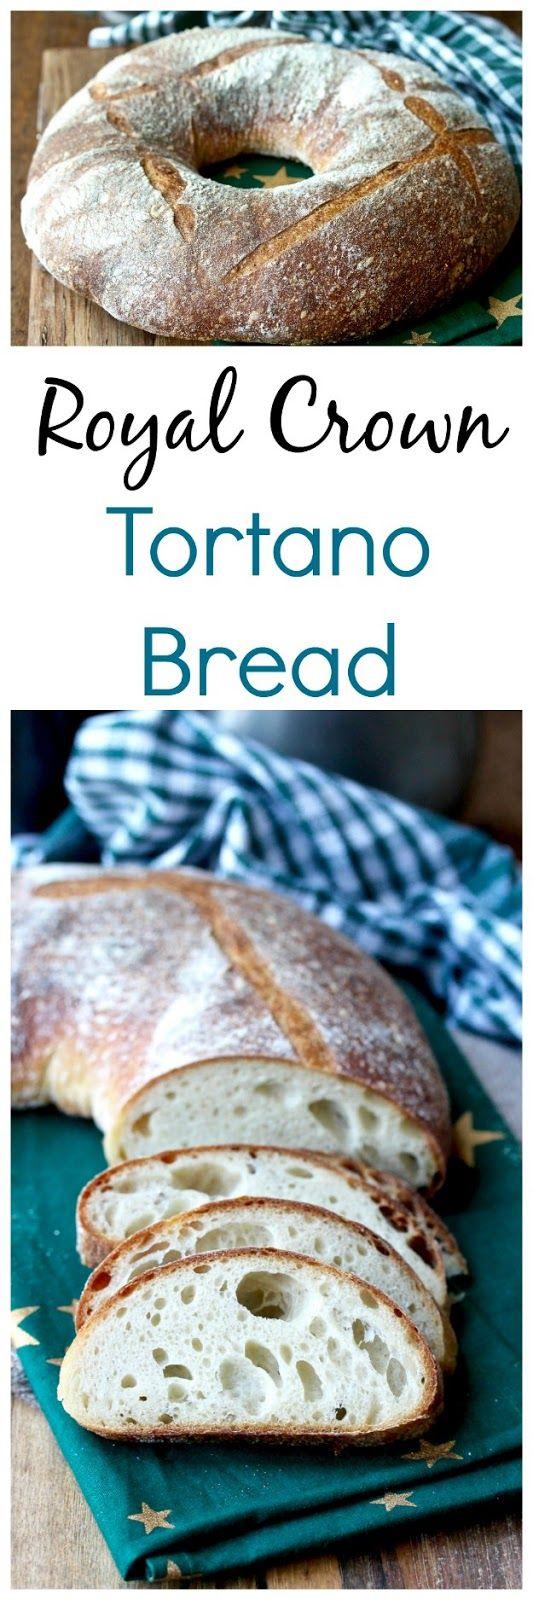 Royal Crown Tortano Bread